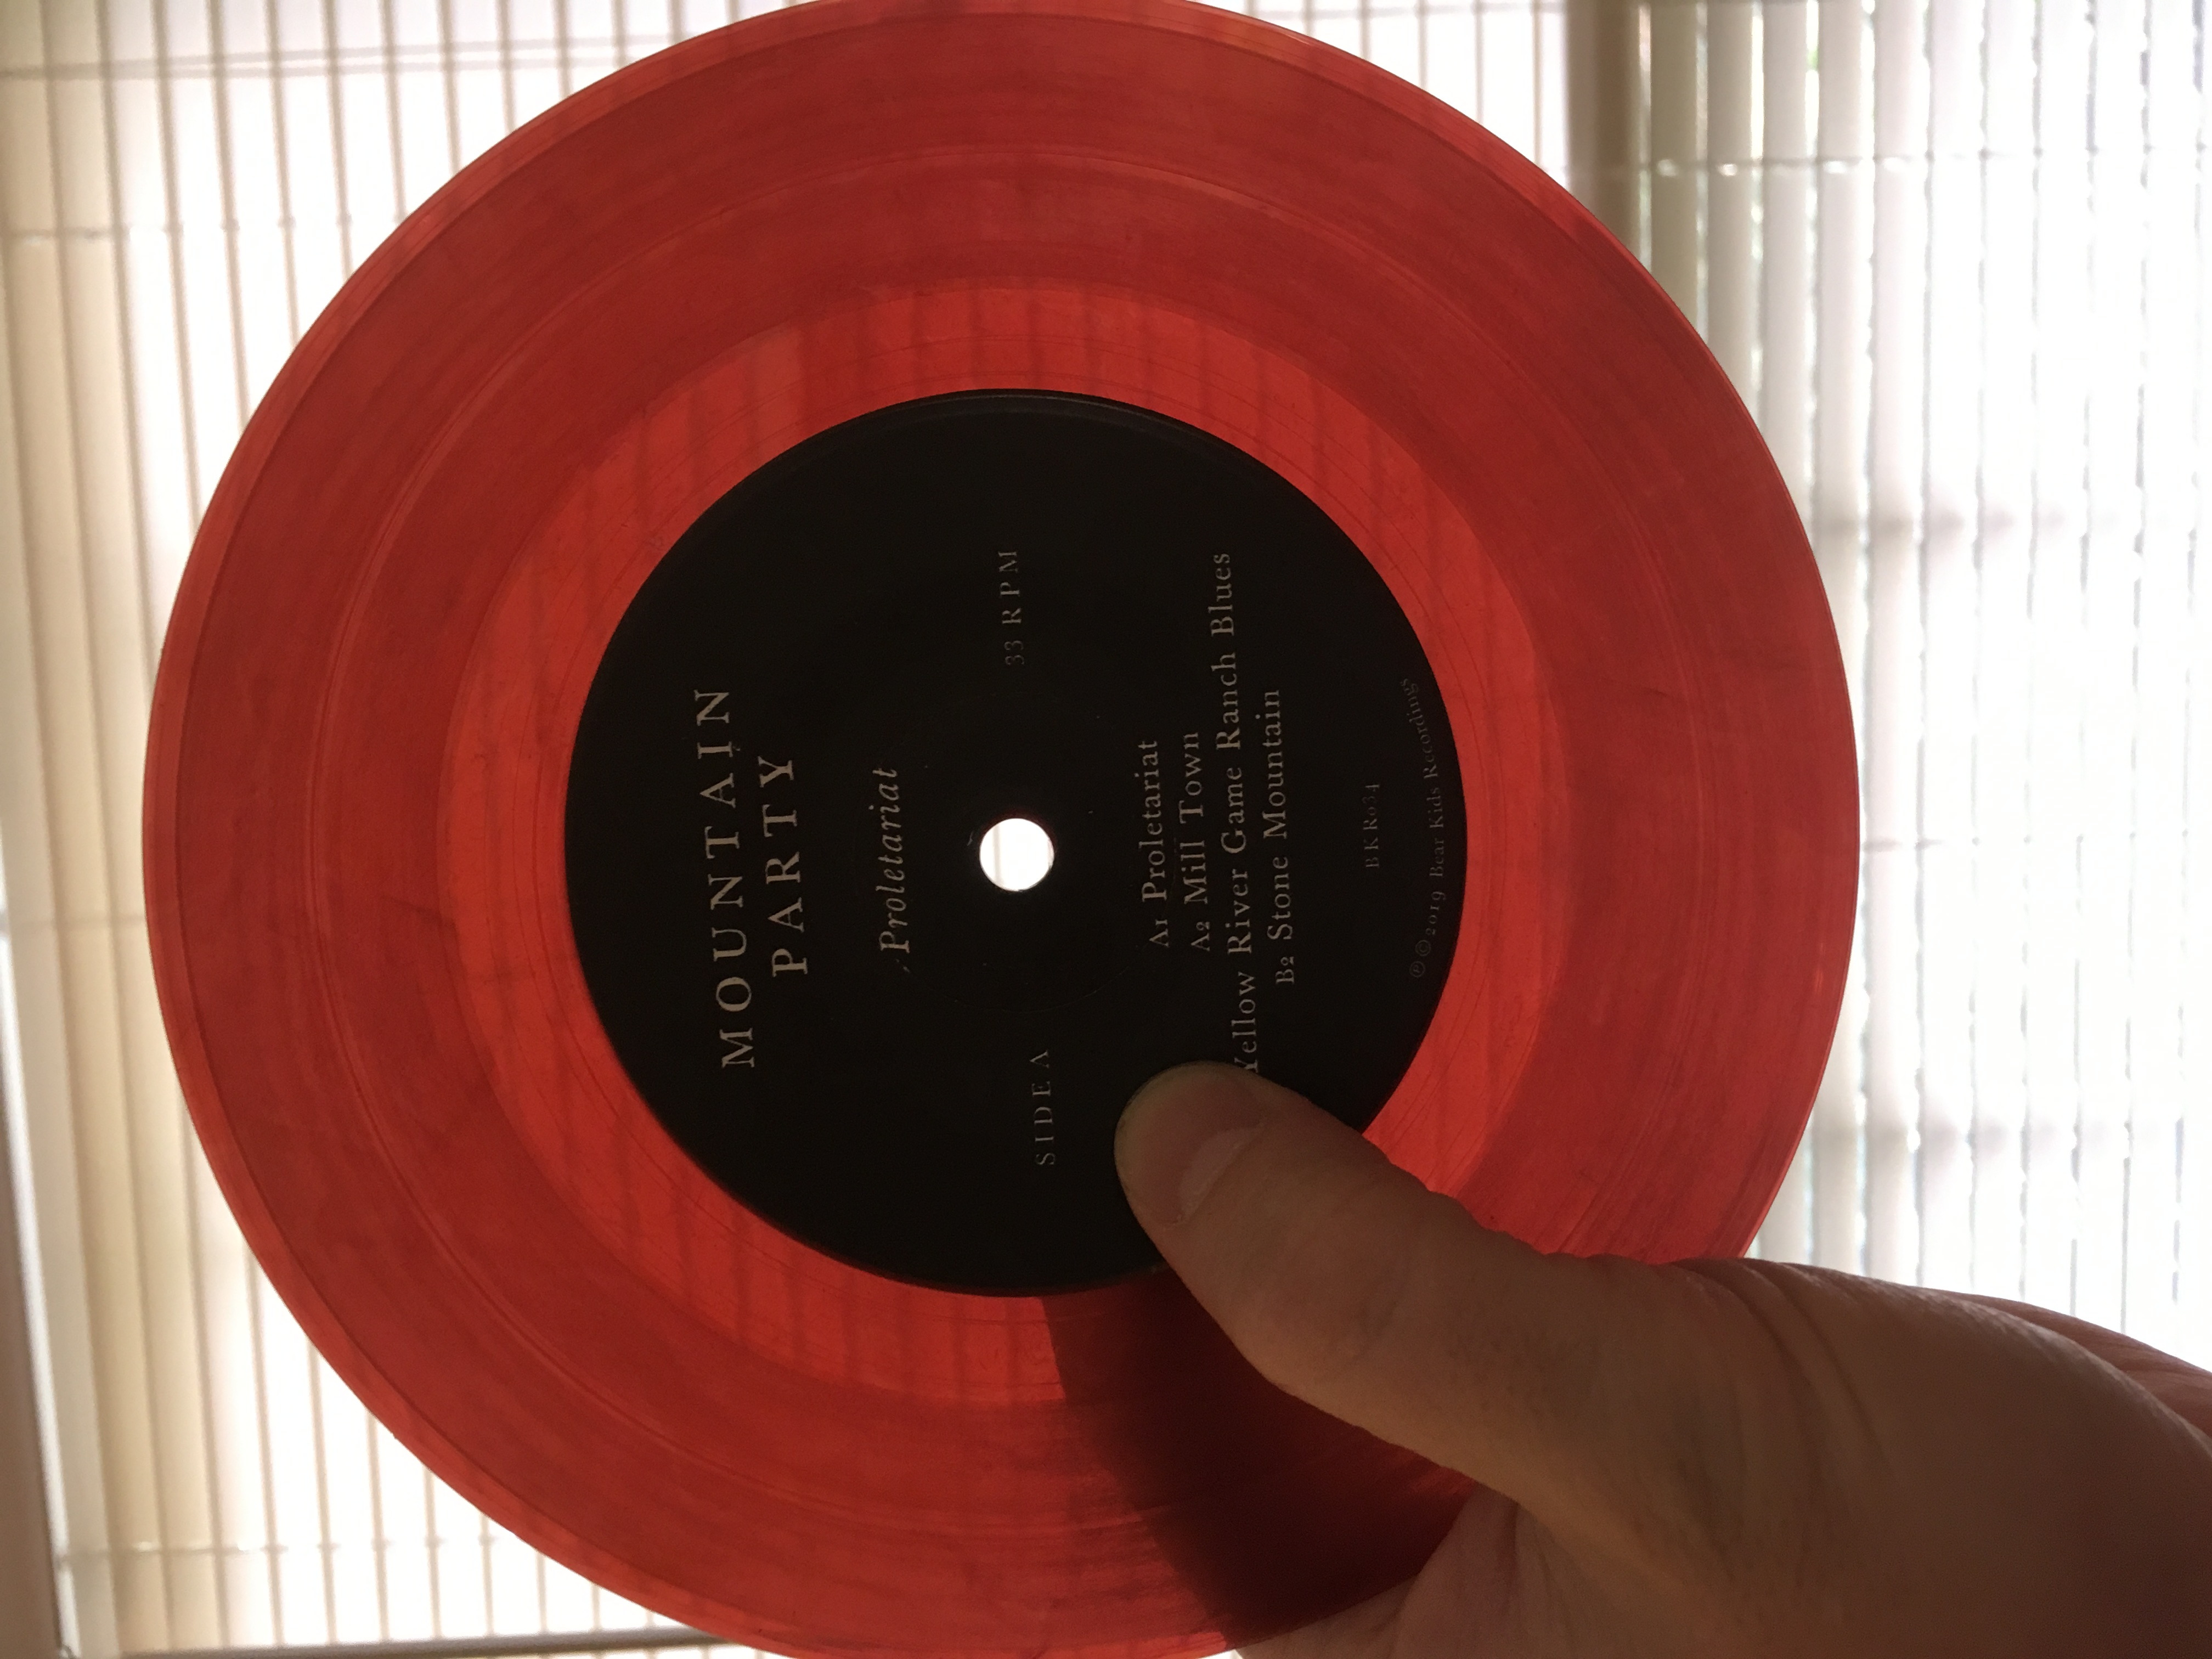 Mountain Party - Proletariat EP